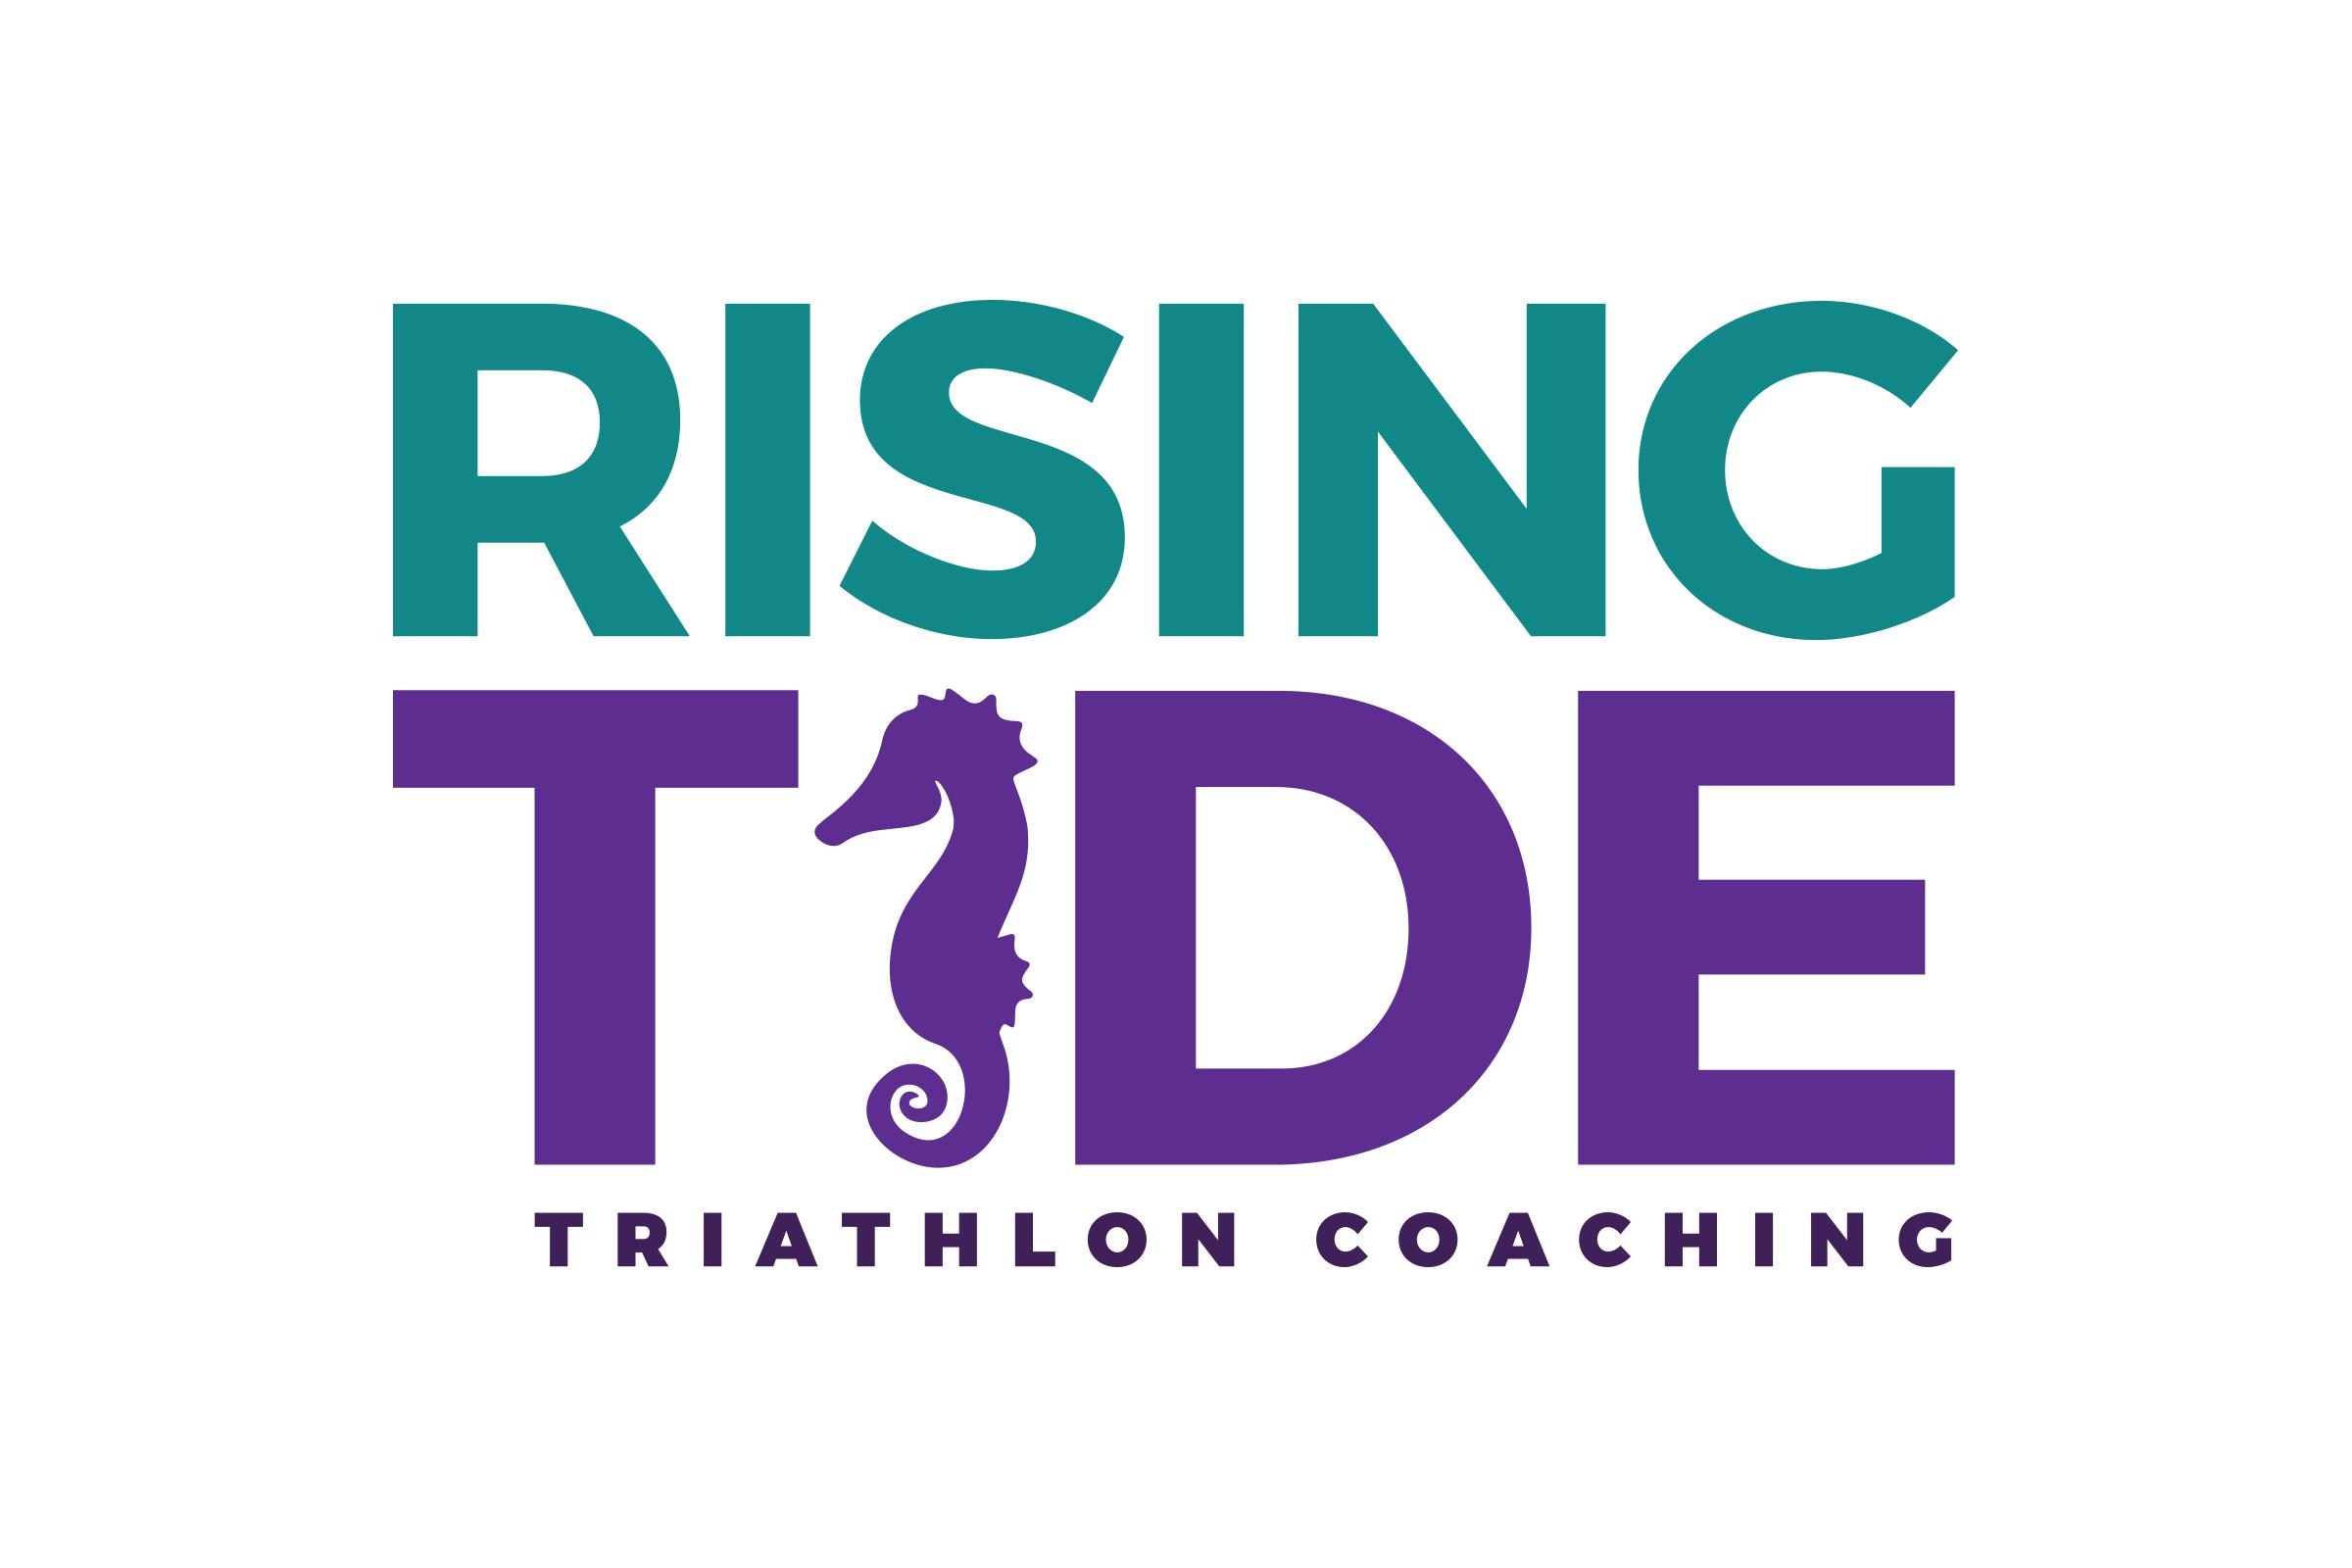 hearthfire-creative-logo-brand-identity-designer-denver-colorado-rising-tide-triathlon-coaching-1.jpg